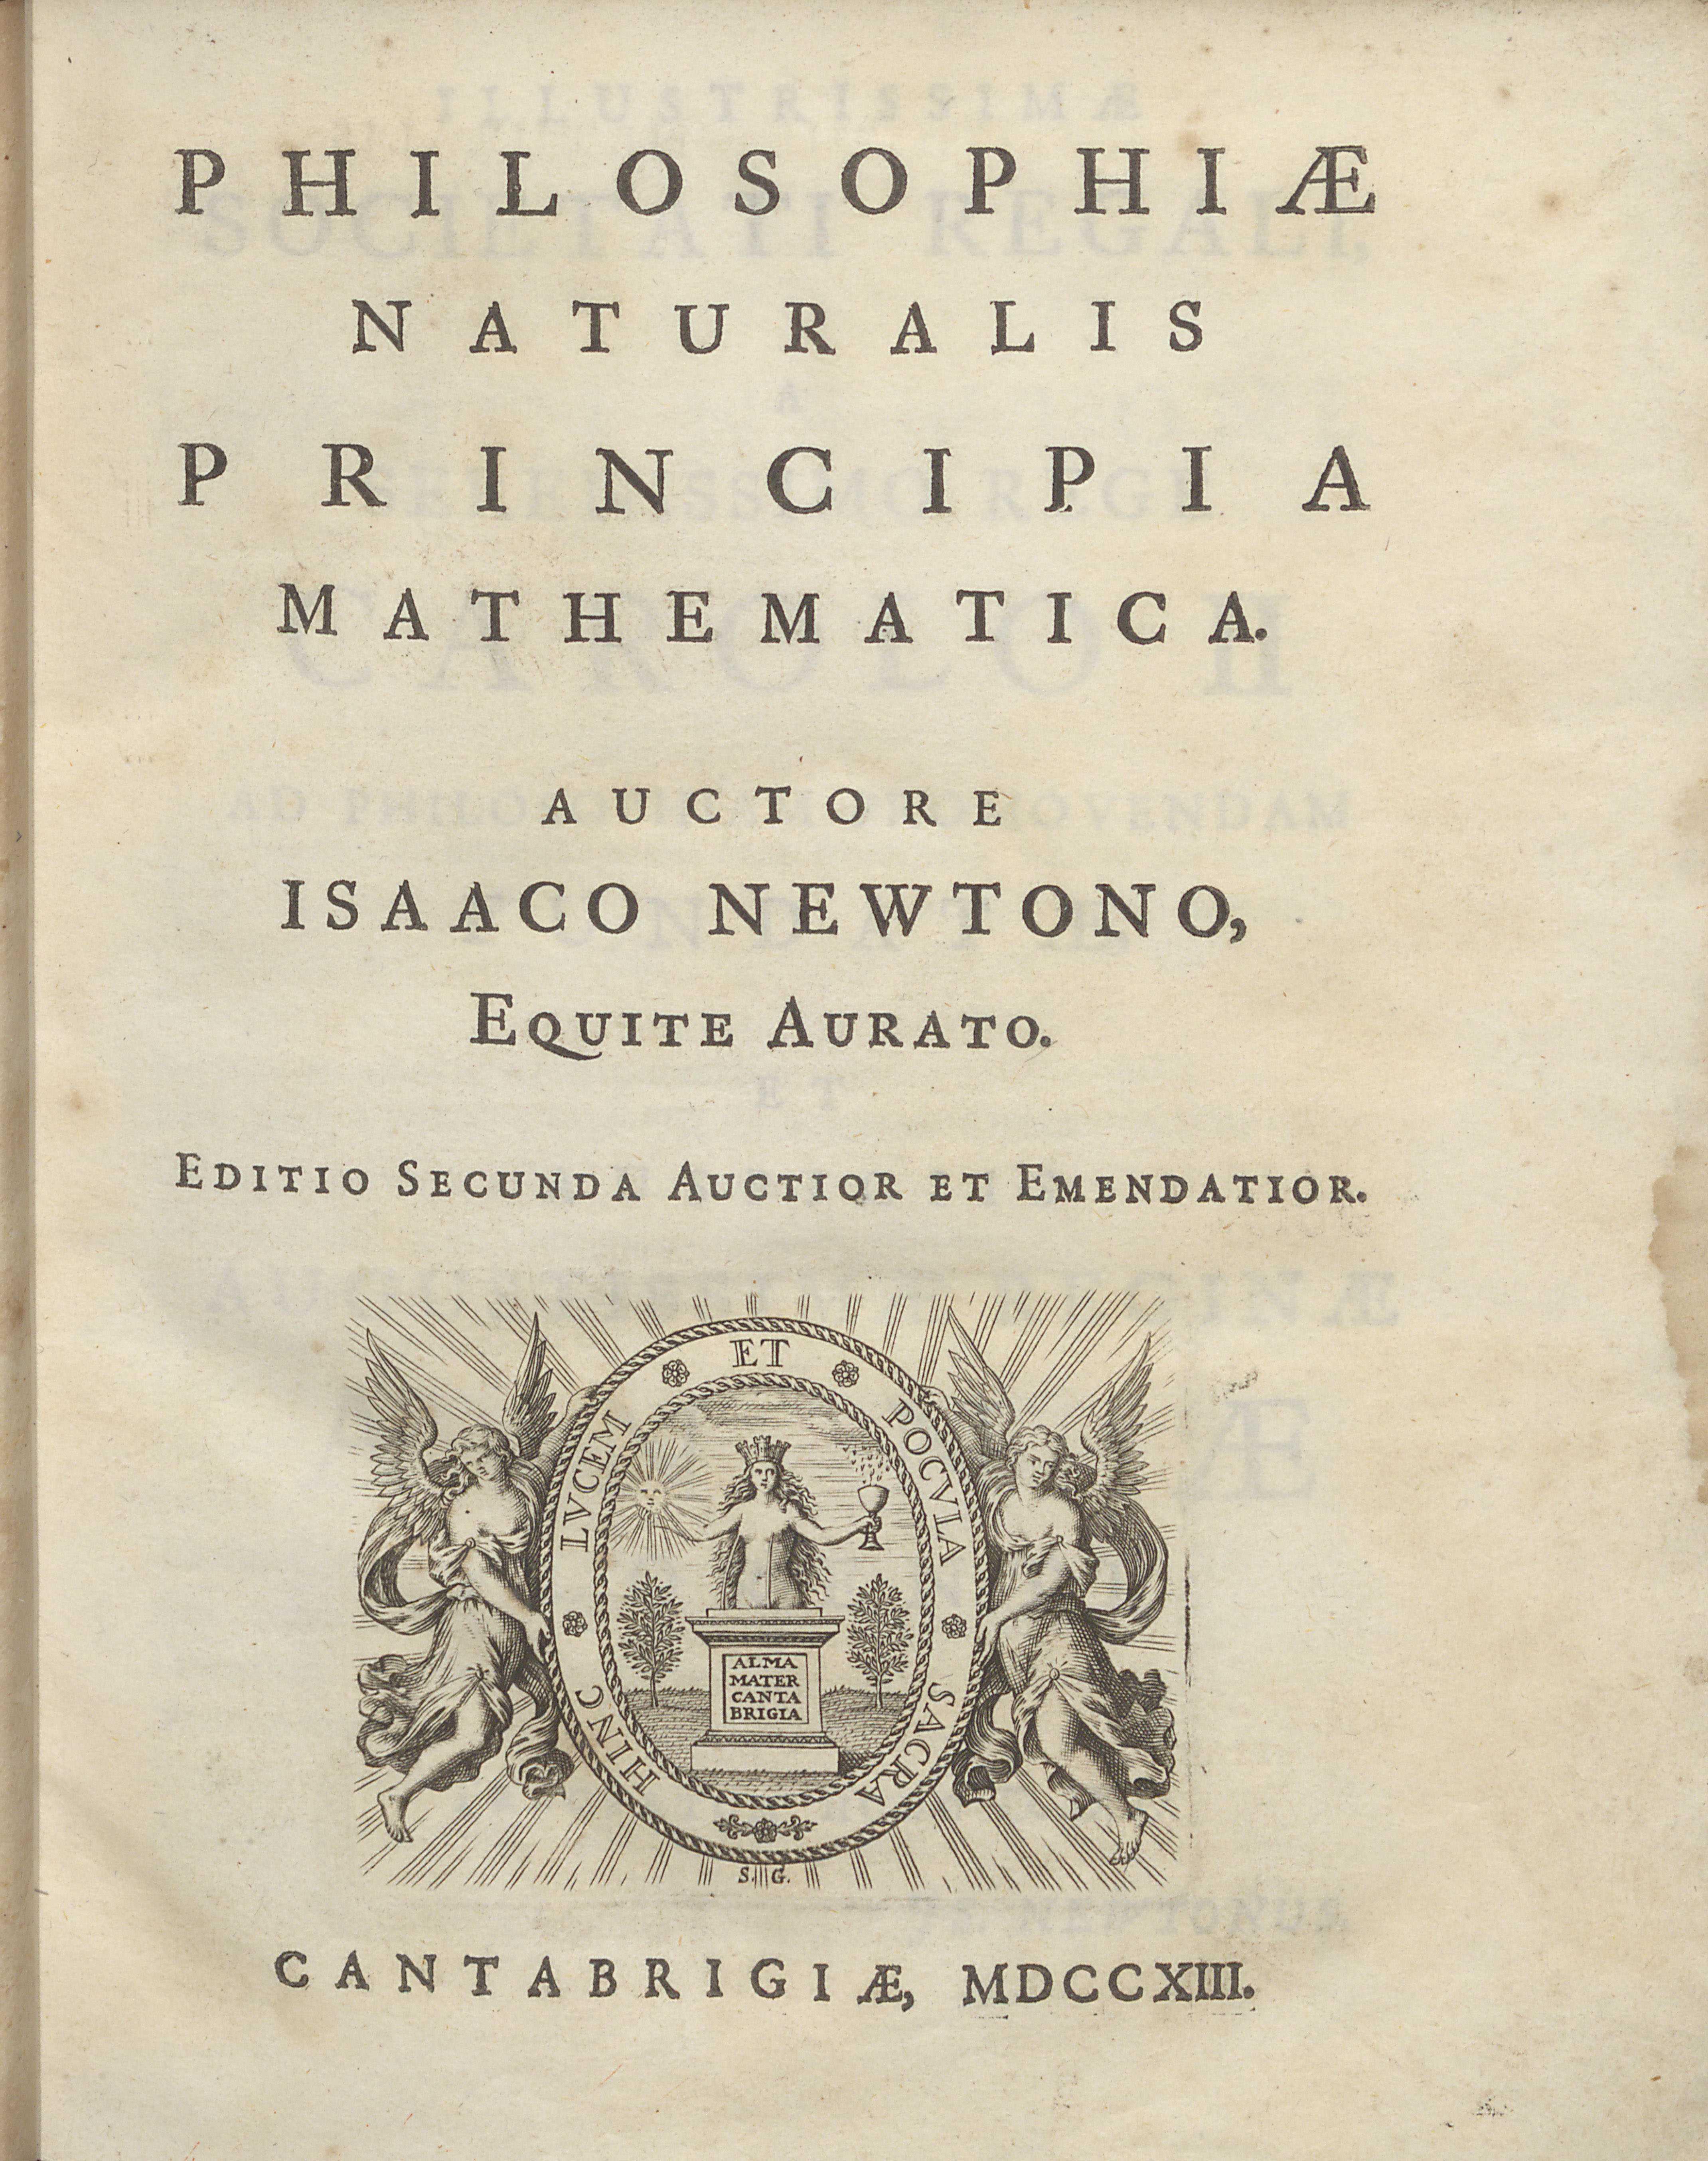 Isaac Newton's Philosophiae Naturalis Principia Mathematica, frontispiece